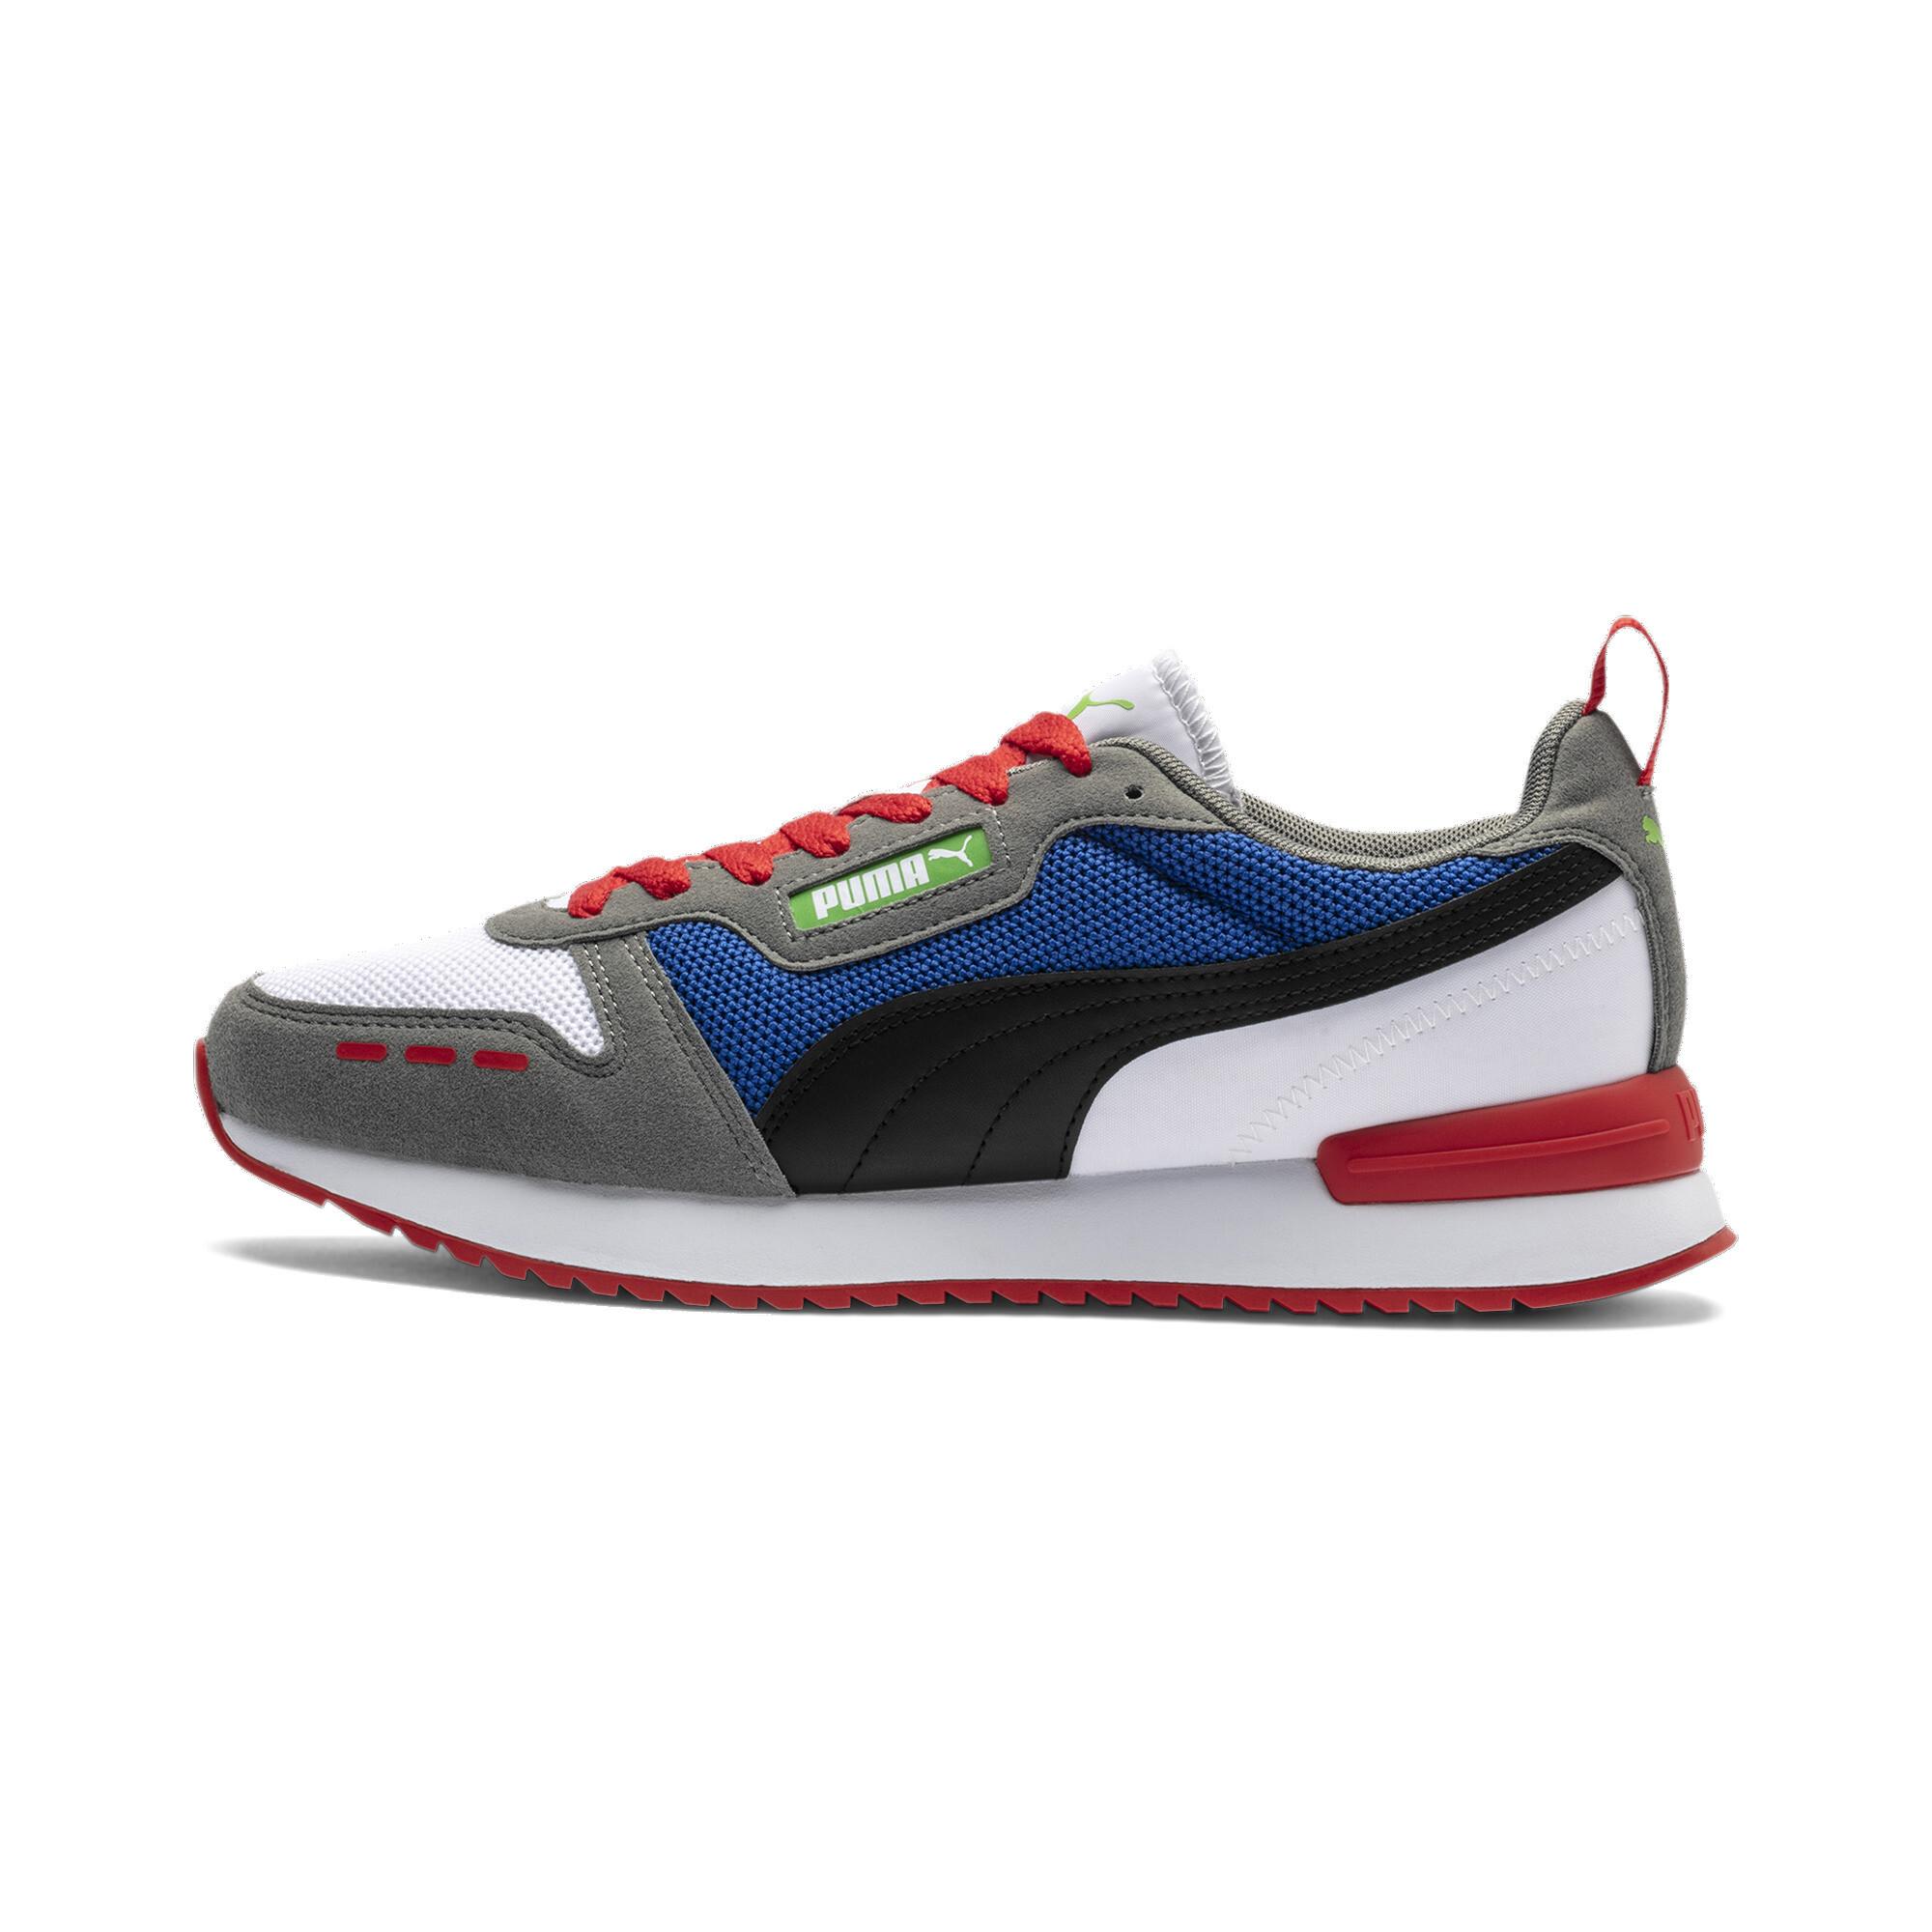 thumbnail 9 - PUMA-Men-039-s-R78-Sneakers